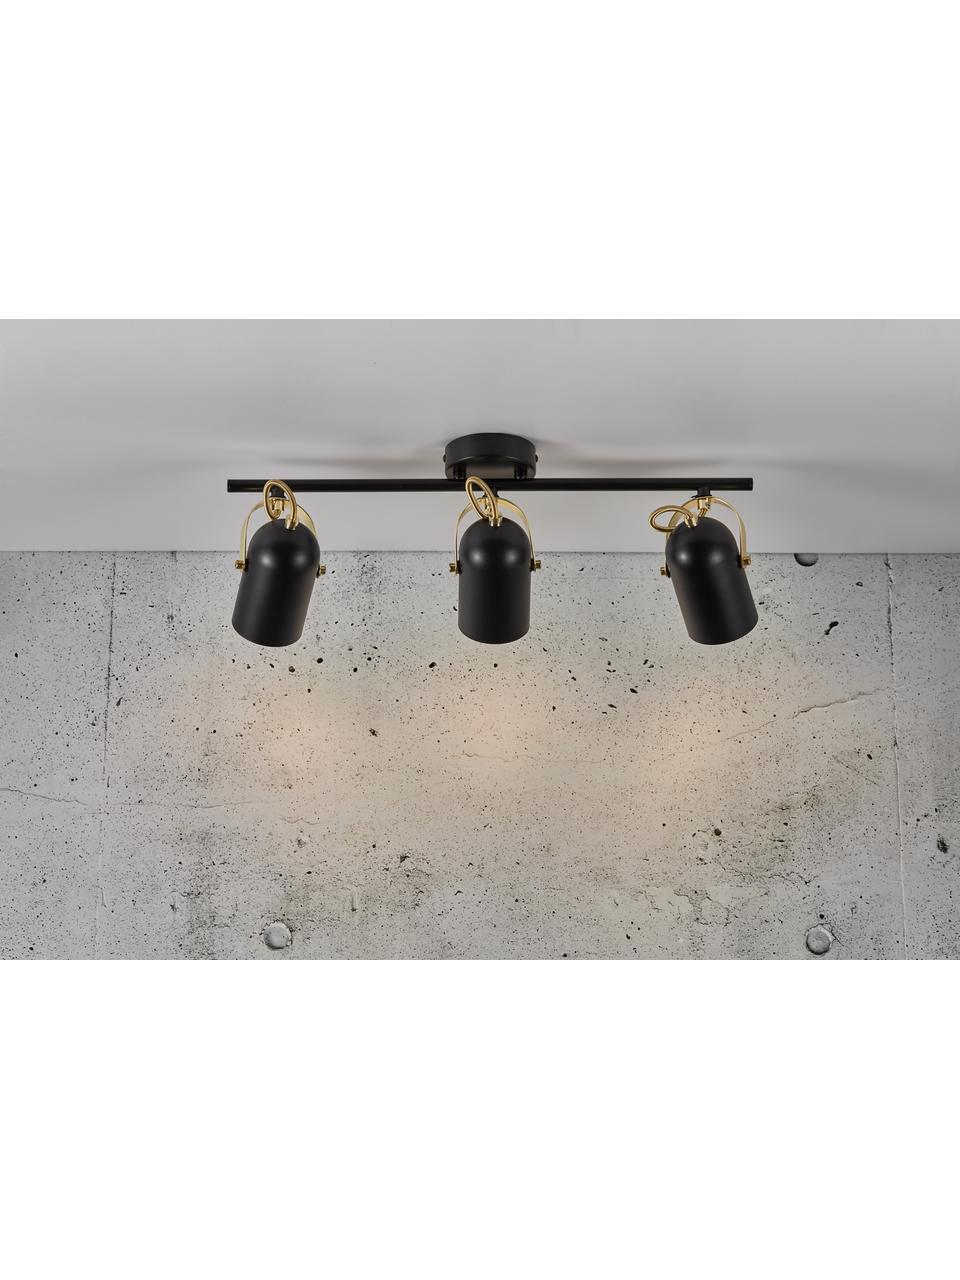 Retro-Deckenstrahler Lotus, Lampenschirm: Metall, beschichtet, Dekor: Metall, beschichtet, Baldachin: Metall, beschichtet, Schwarz, Messingfarben, 58 x 20 cm